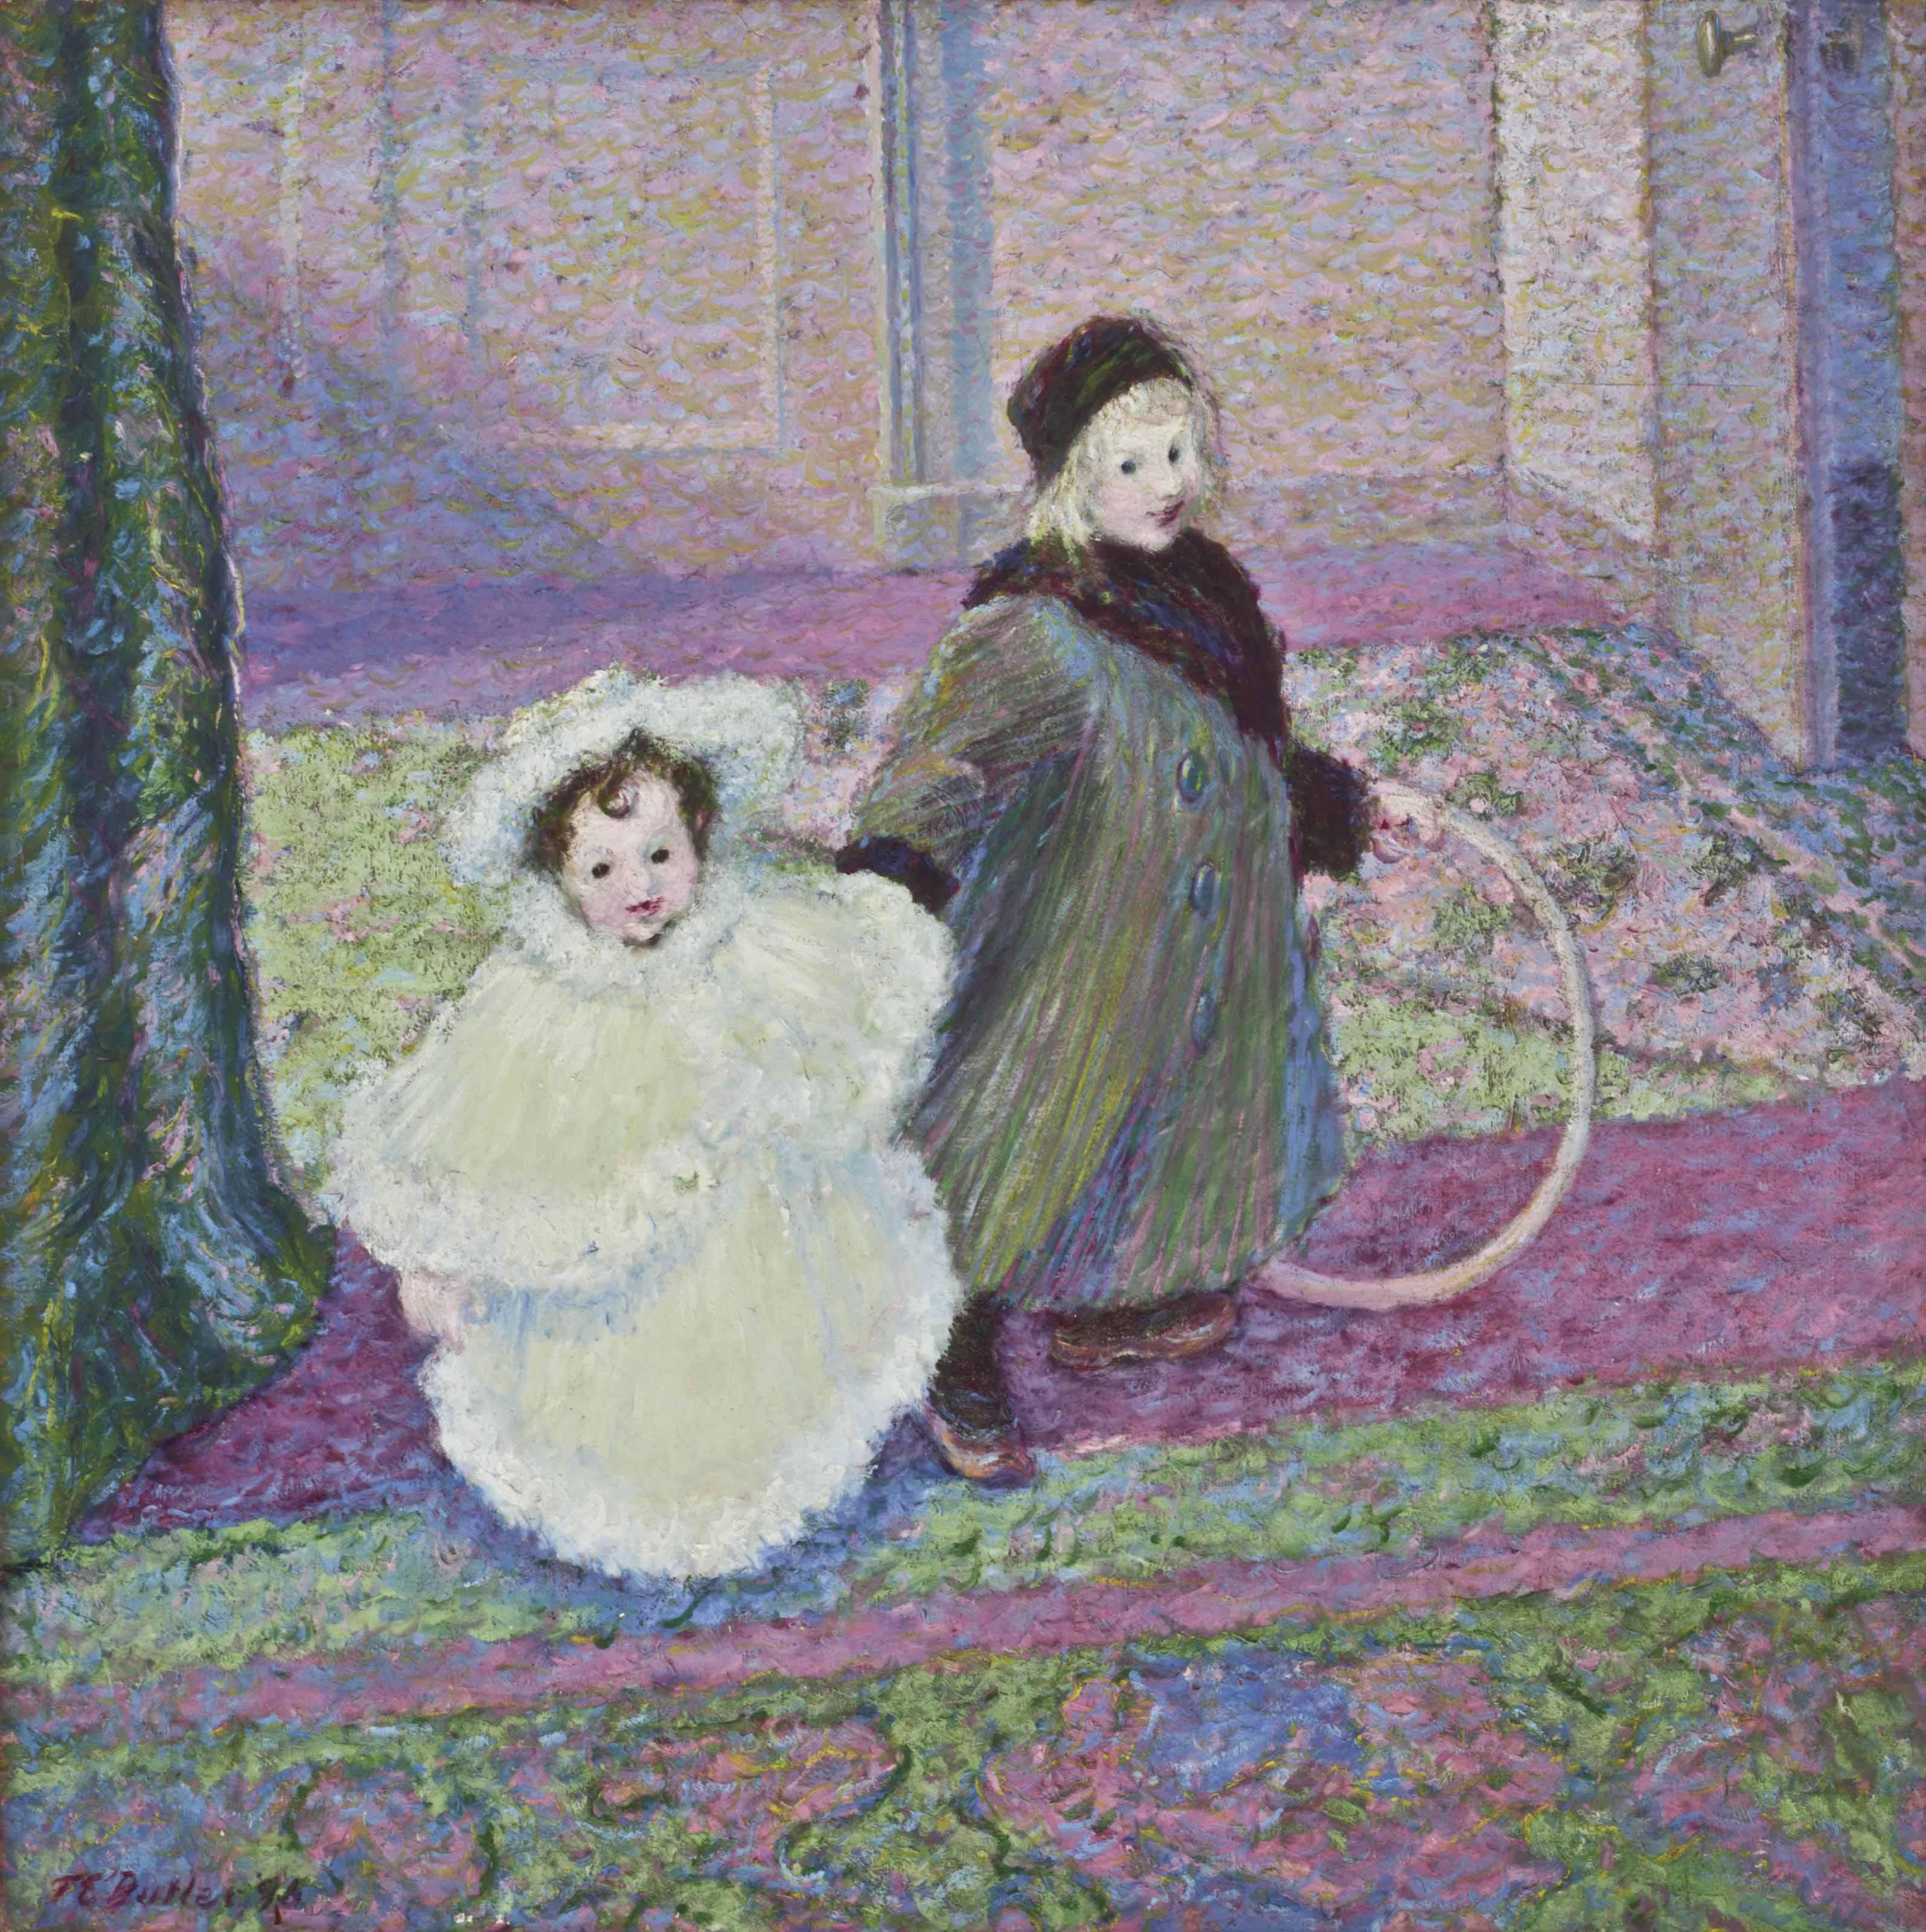 The Artist's Children, James and Lili